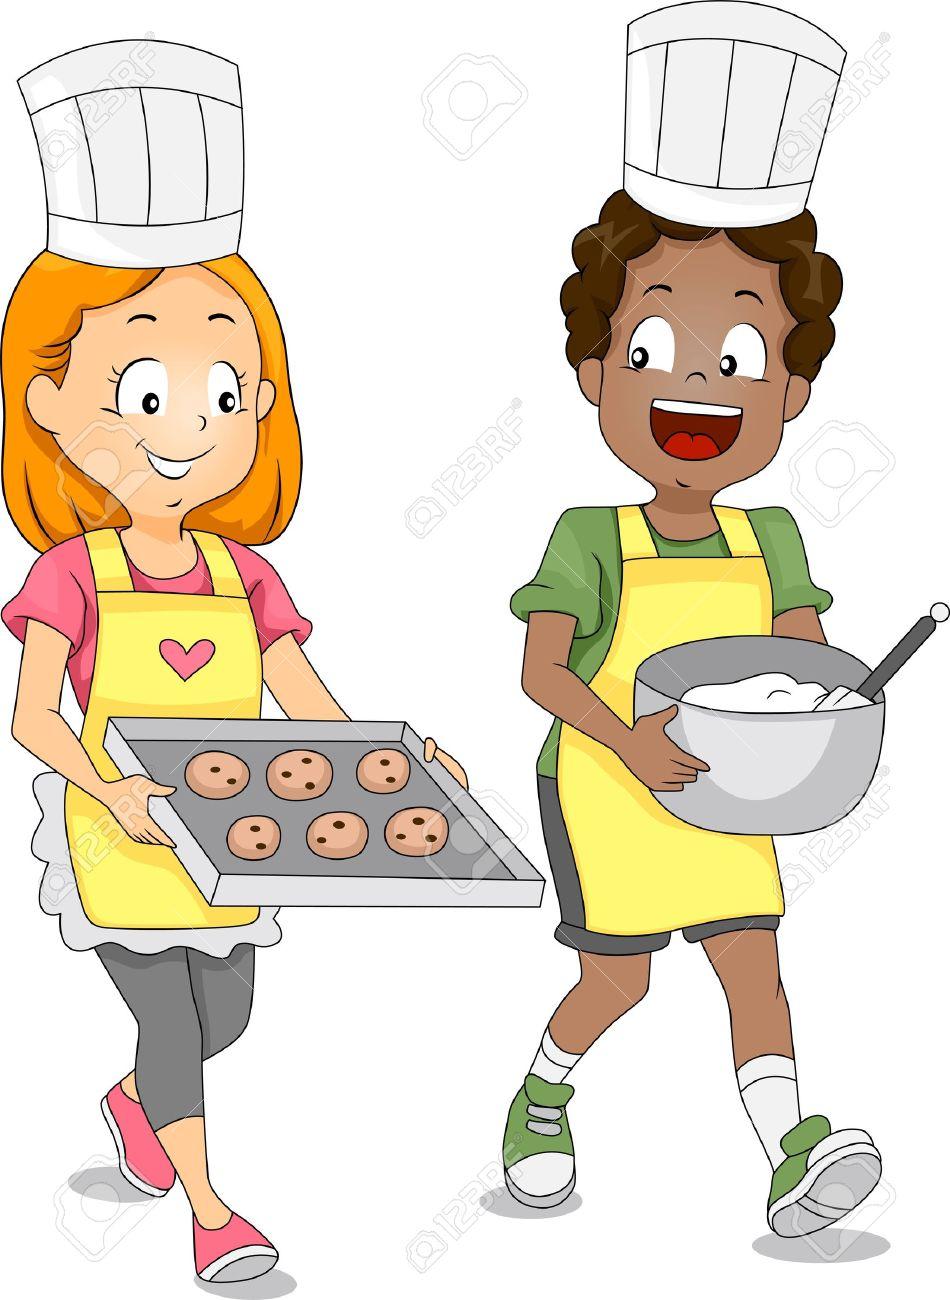 Bake cookies clipart.